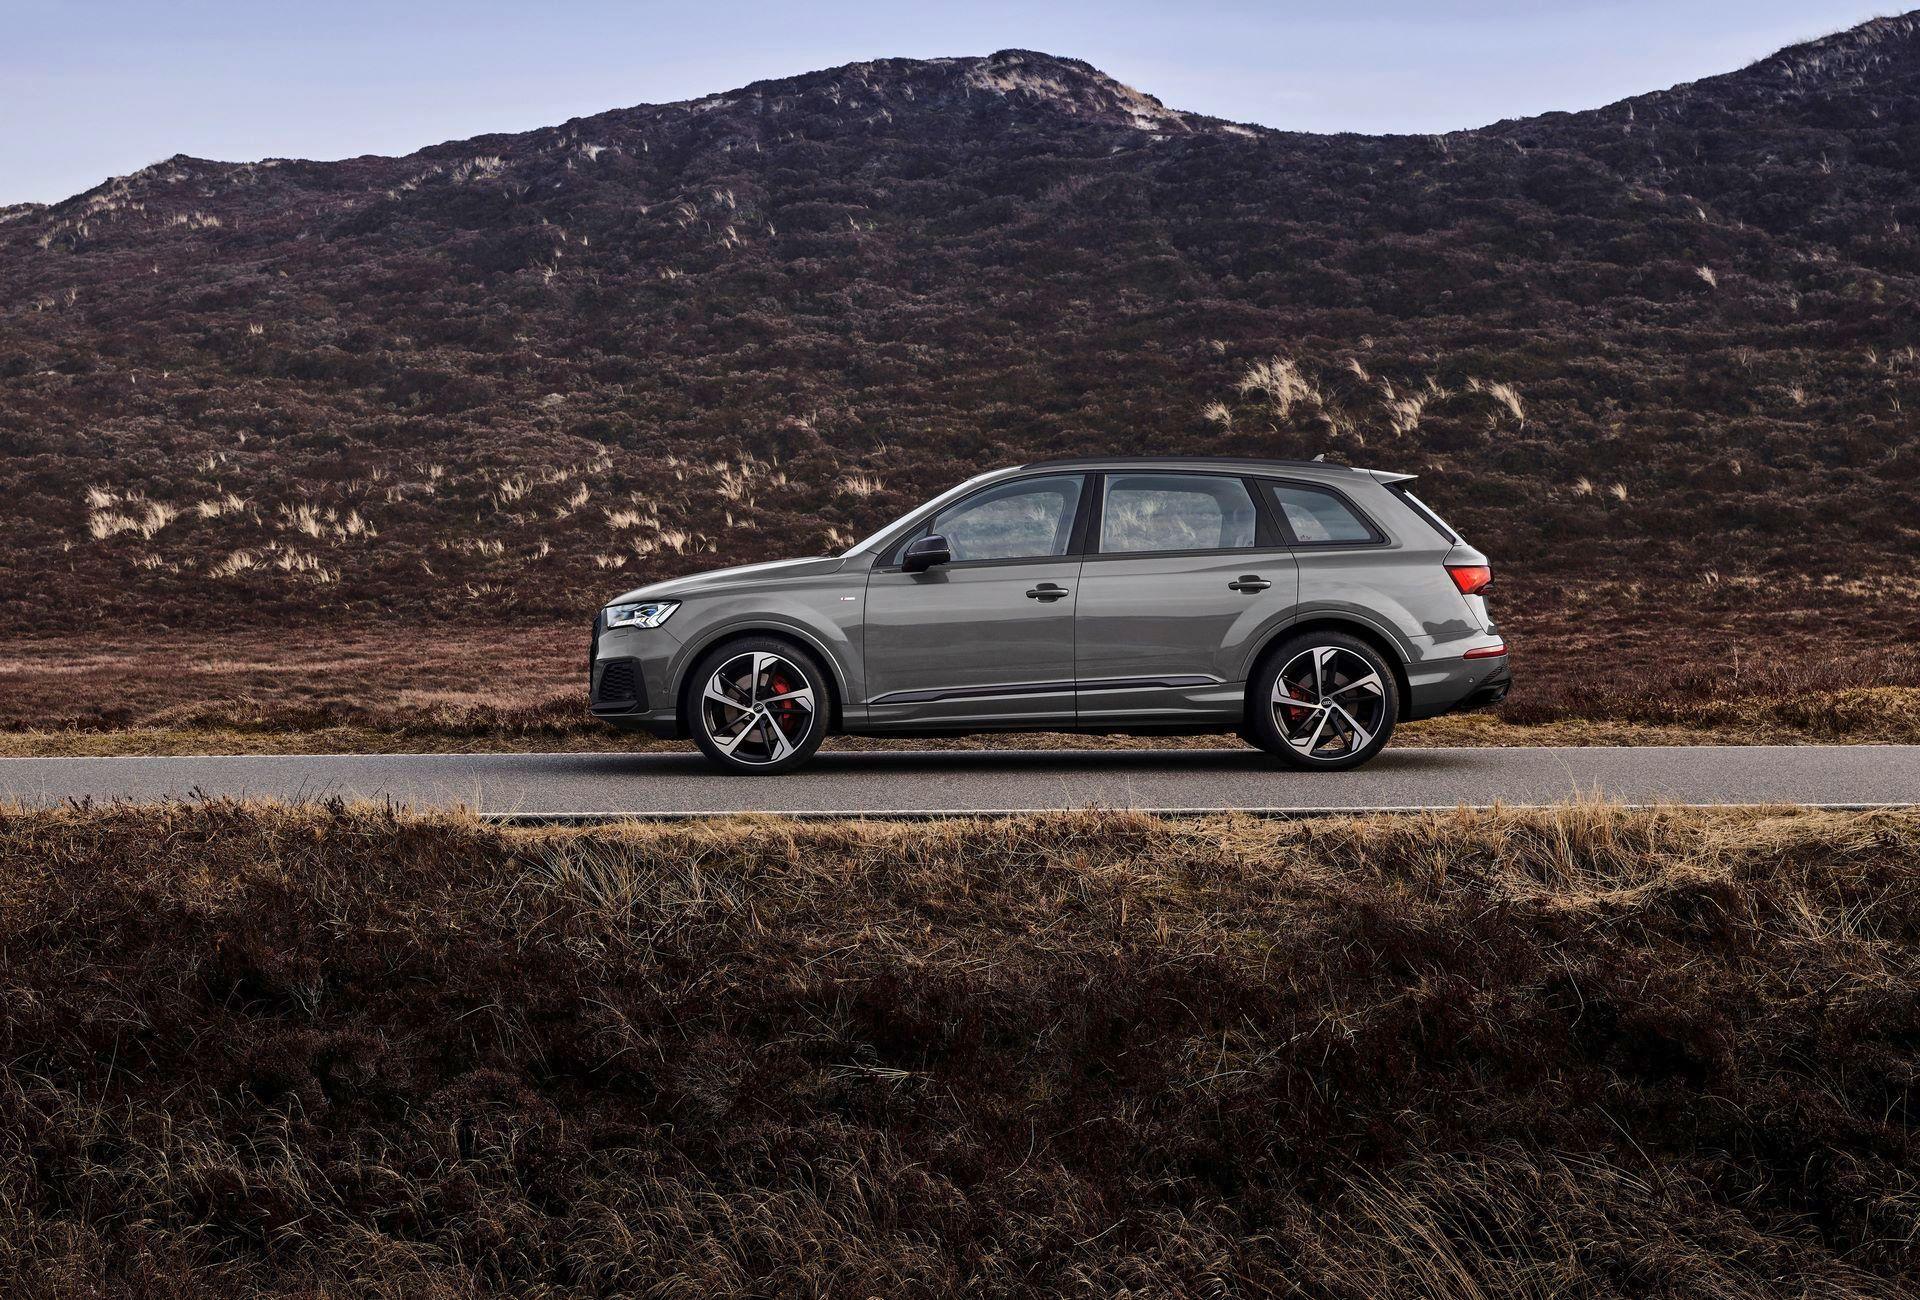 Audi-A4-A5-Q7-Q8-Competition-And-Competition-Plus-Trims-41